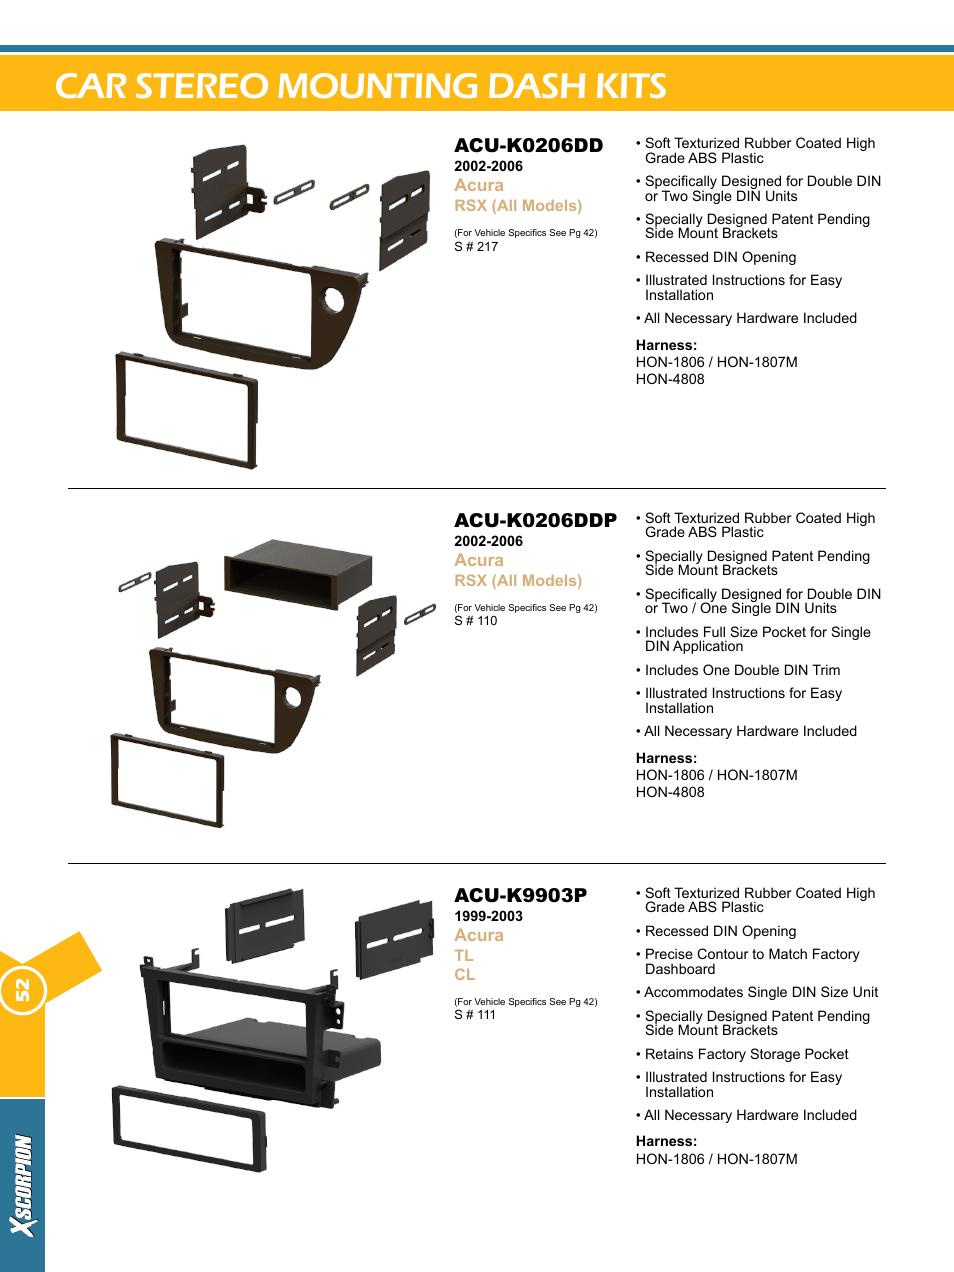 Car stereo mounting dash kits, Acu-k0206dd, Acu-k0206ddp | Xscorpion Dash  kit, Harness and Antenna Catalog User Manual | Page 52 / 116